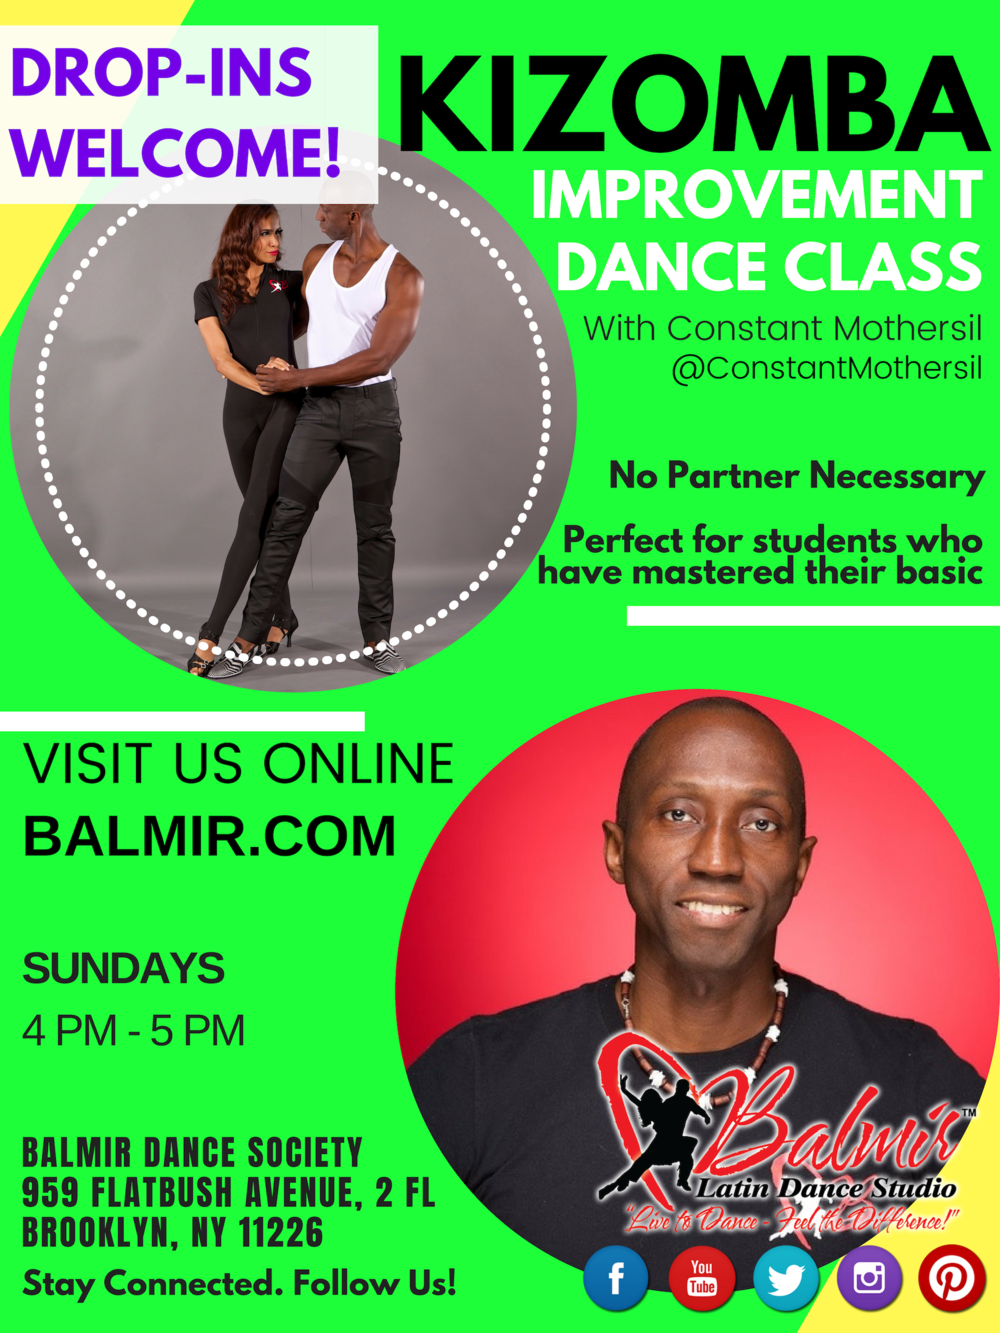 Kizomba Improvement Classes Beginner Brooklyn Dance Classes Balmir NYC Lessons.png